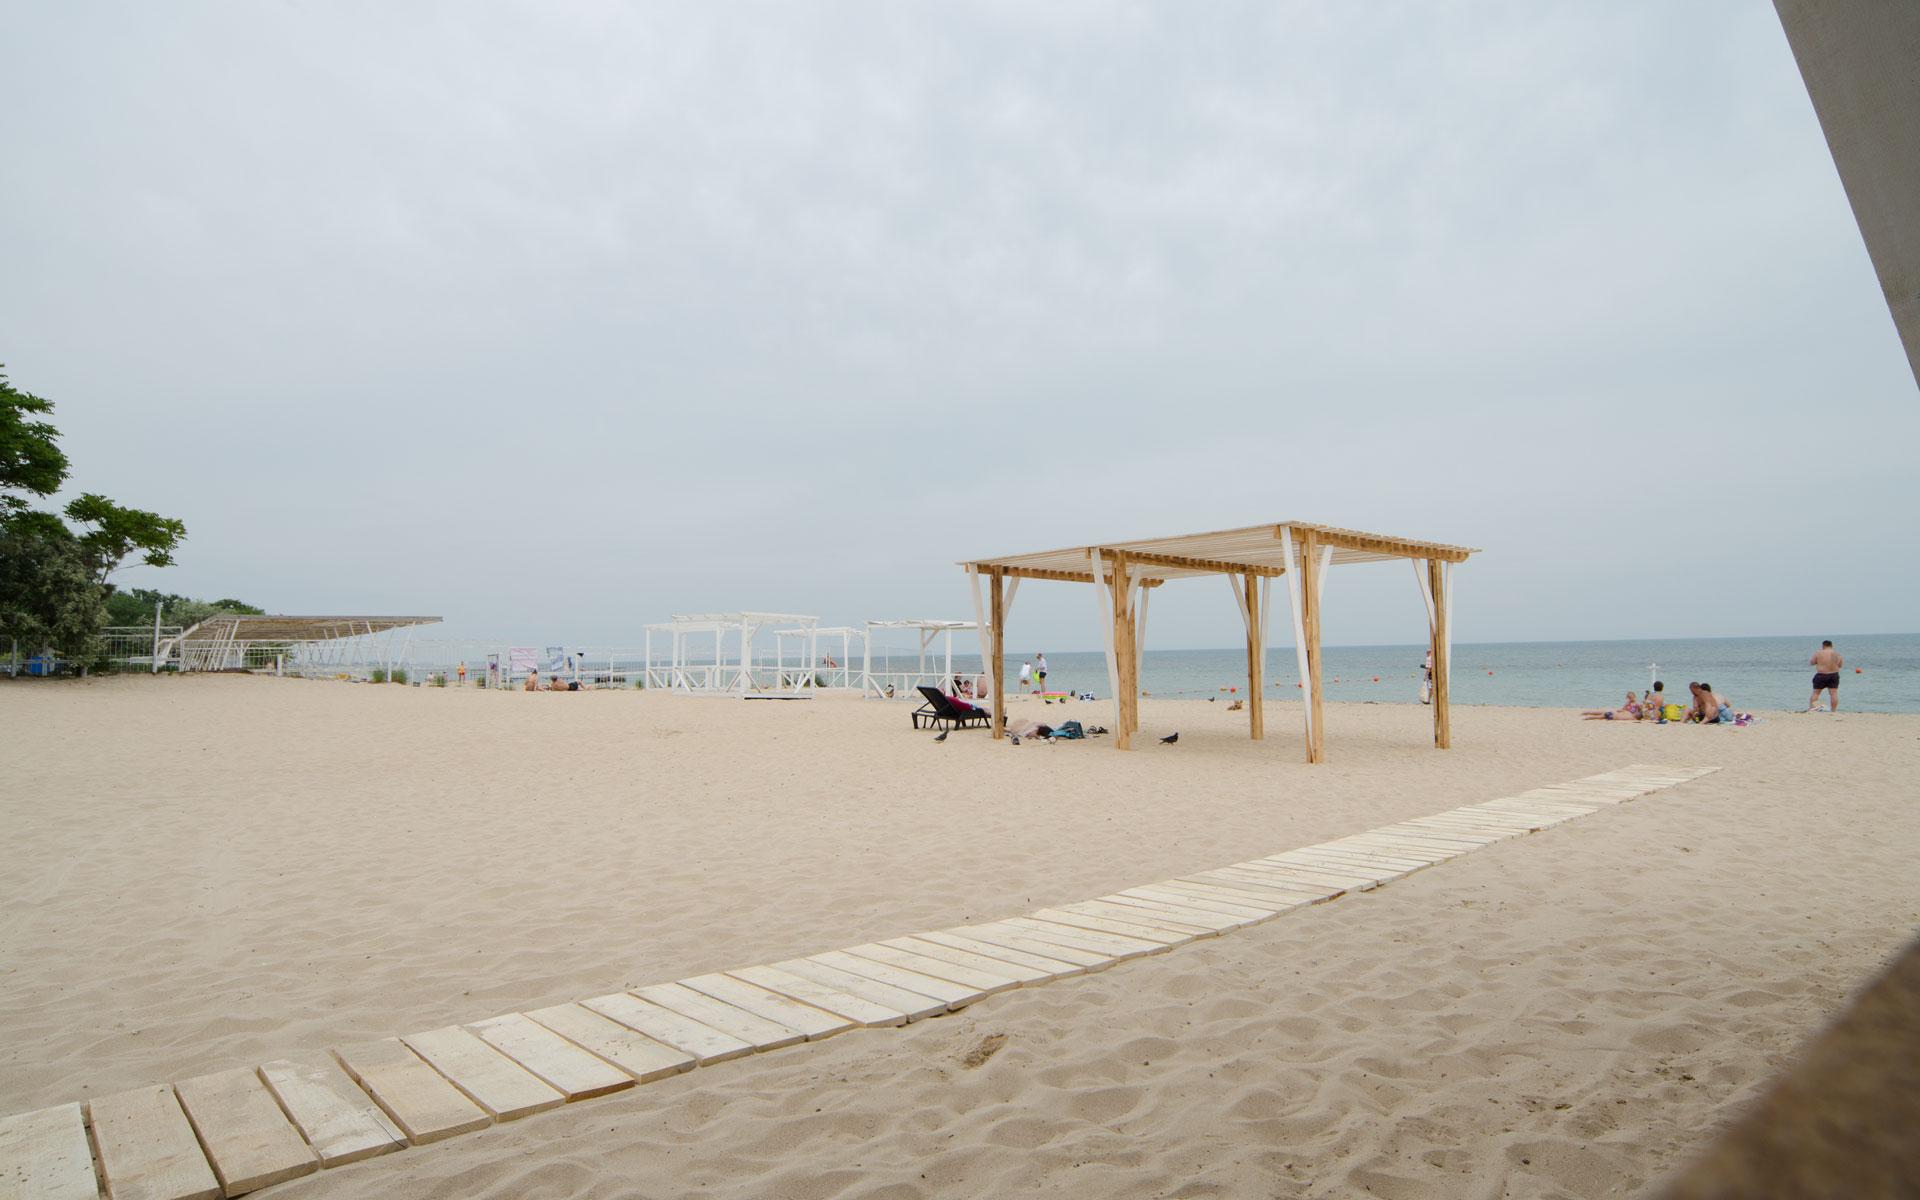 На пляже. Фото Заозёрного